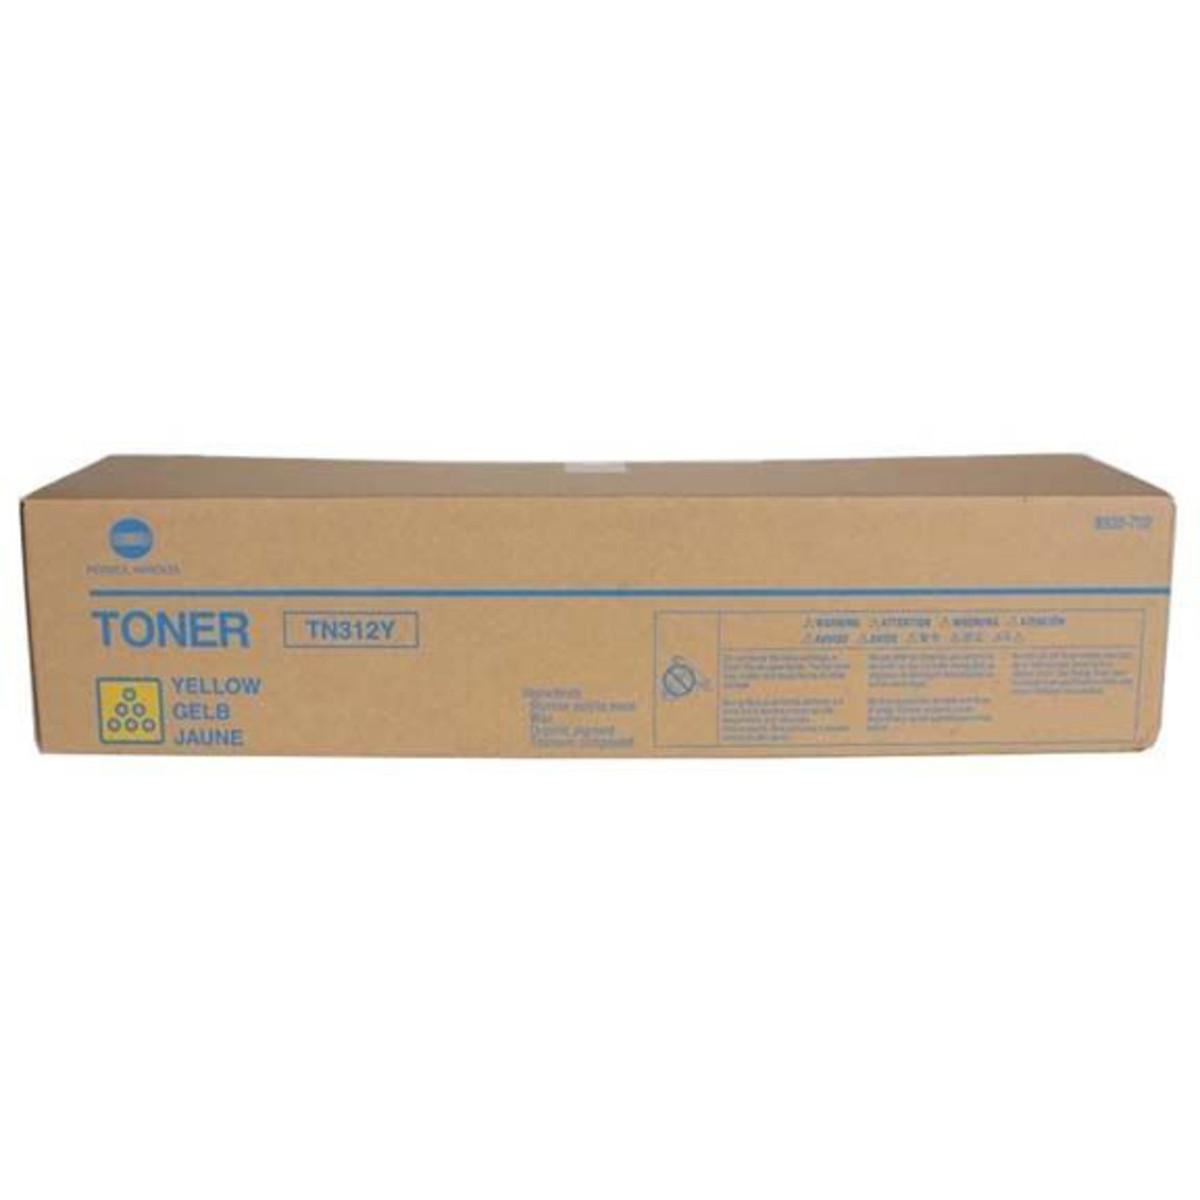 Konica Minolta 8938-706 Black Copier Cartridge